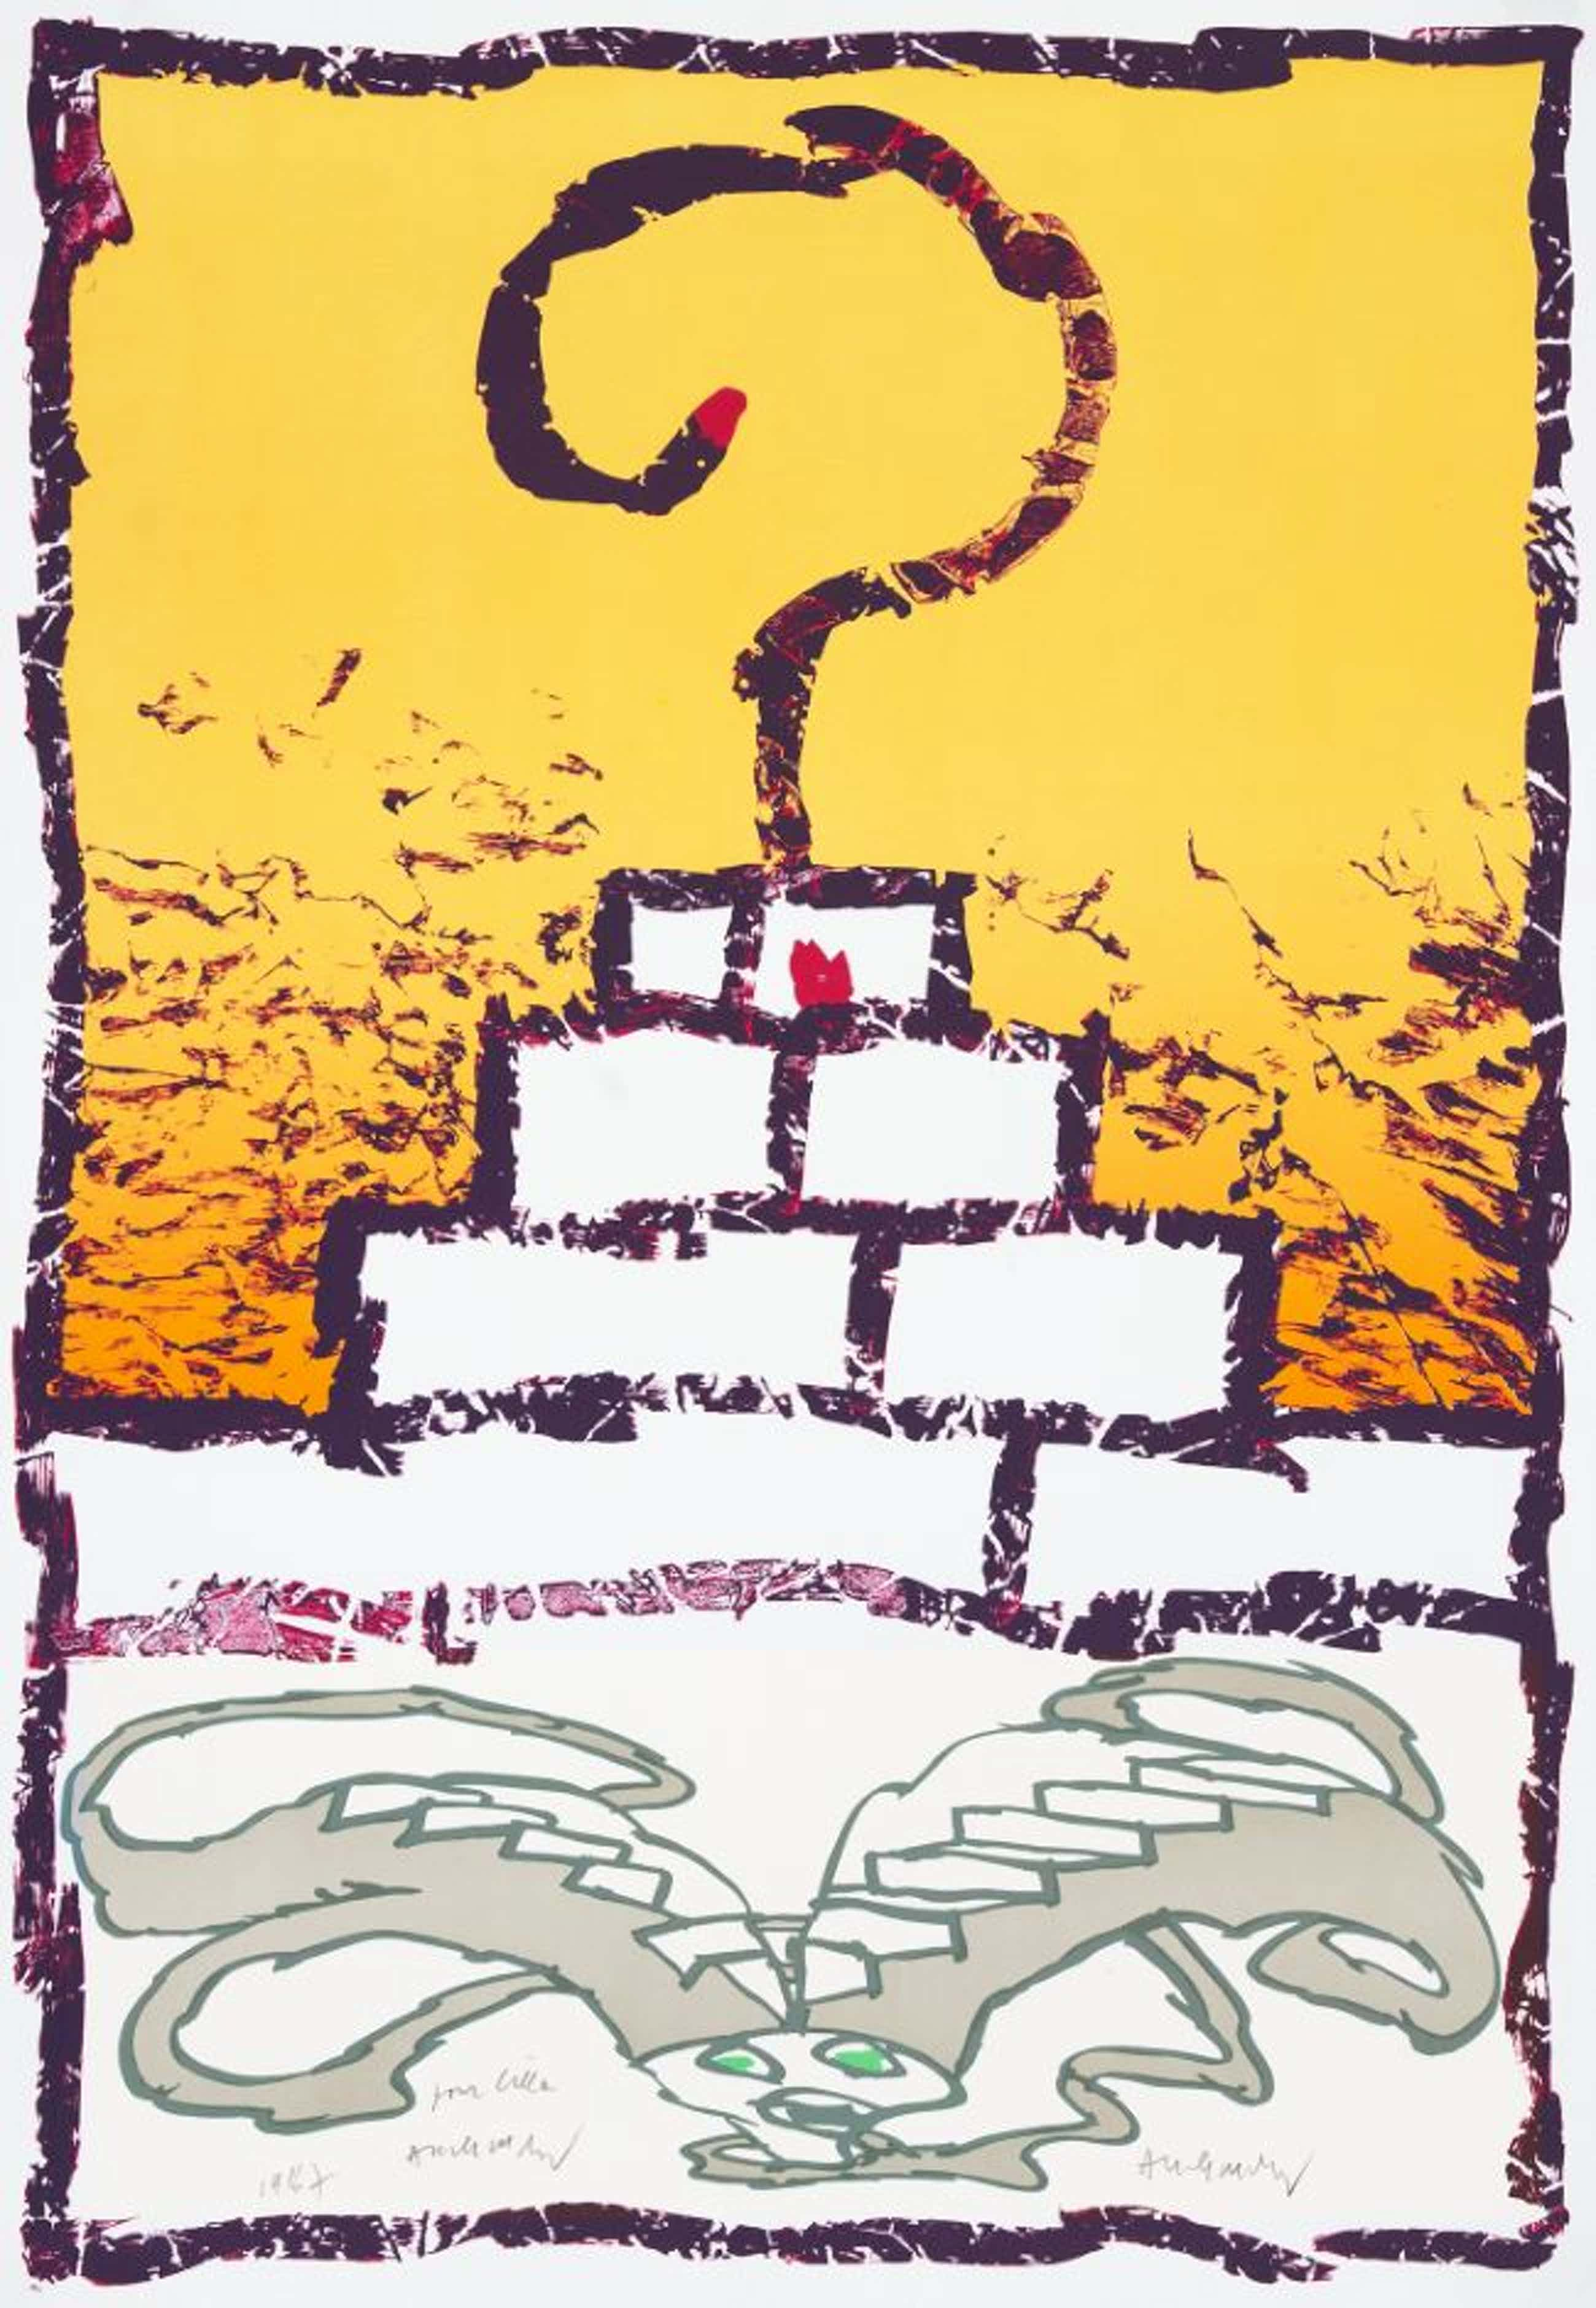 Pierre Alechinsky - Zigurat III- Zeldzame Litho - 1986 kopen? Bied vanaf 850!